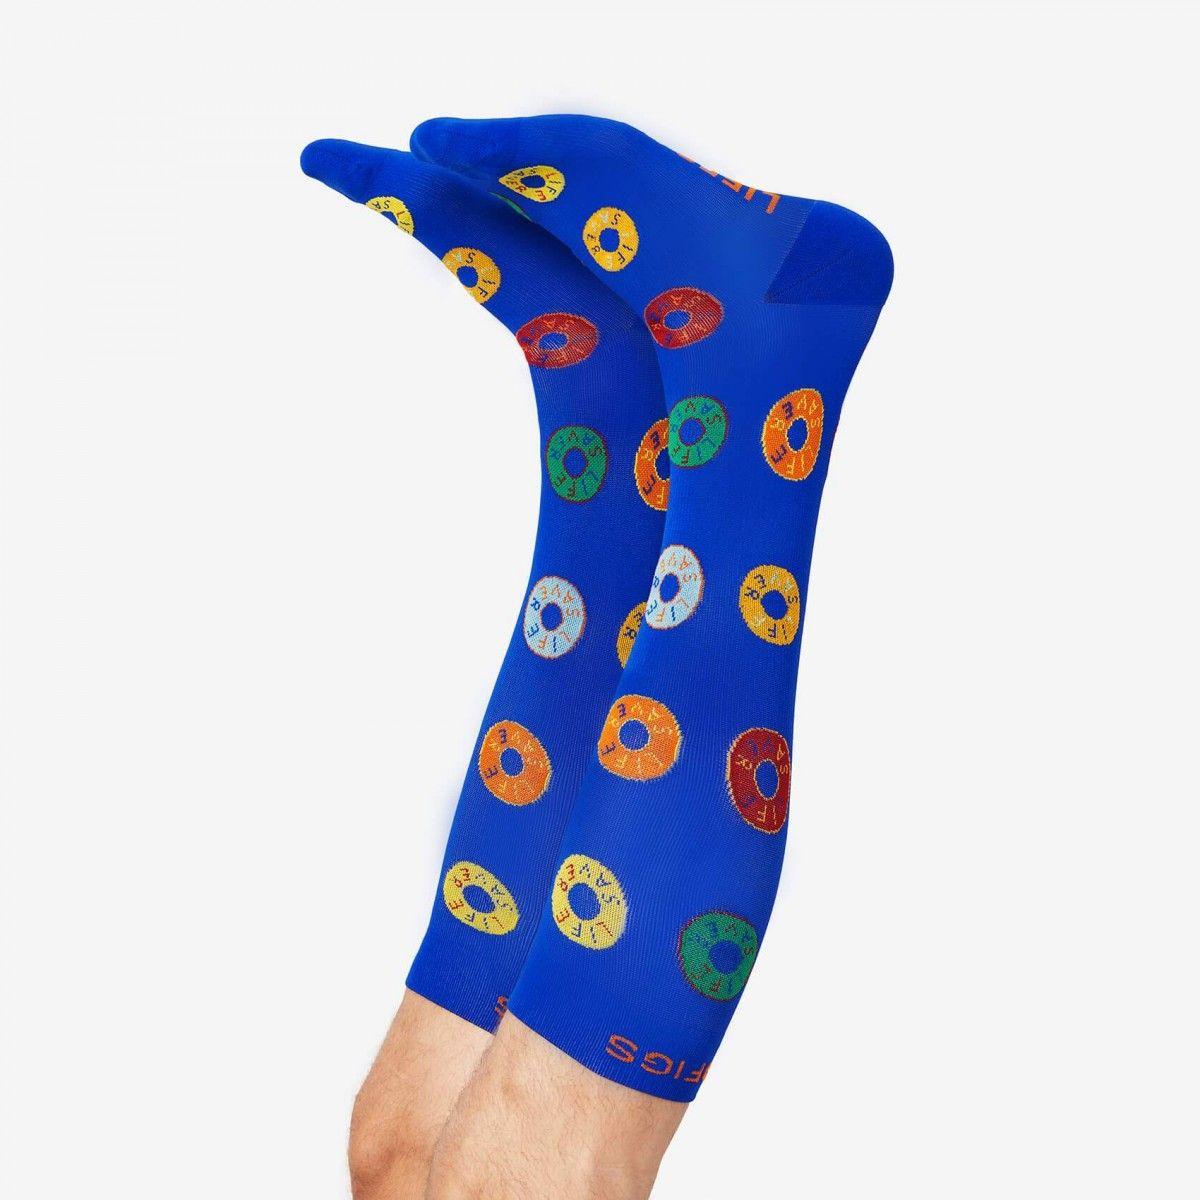 Mens Compression Socks Lifesaver Socks, Men, Fashion